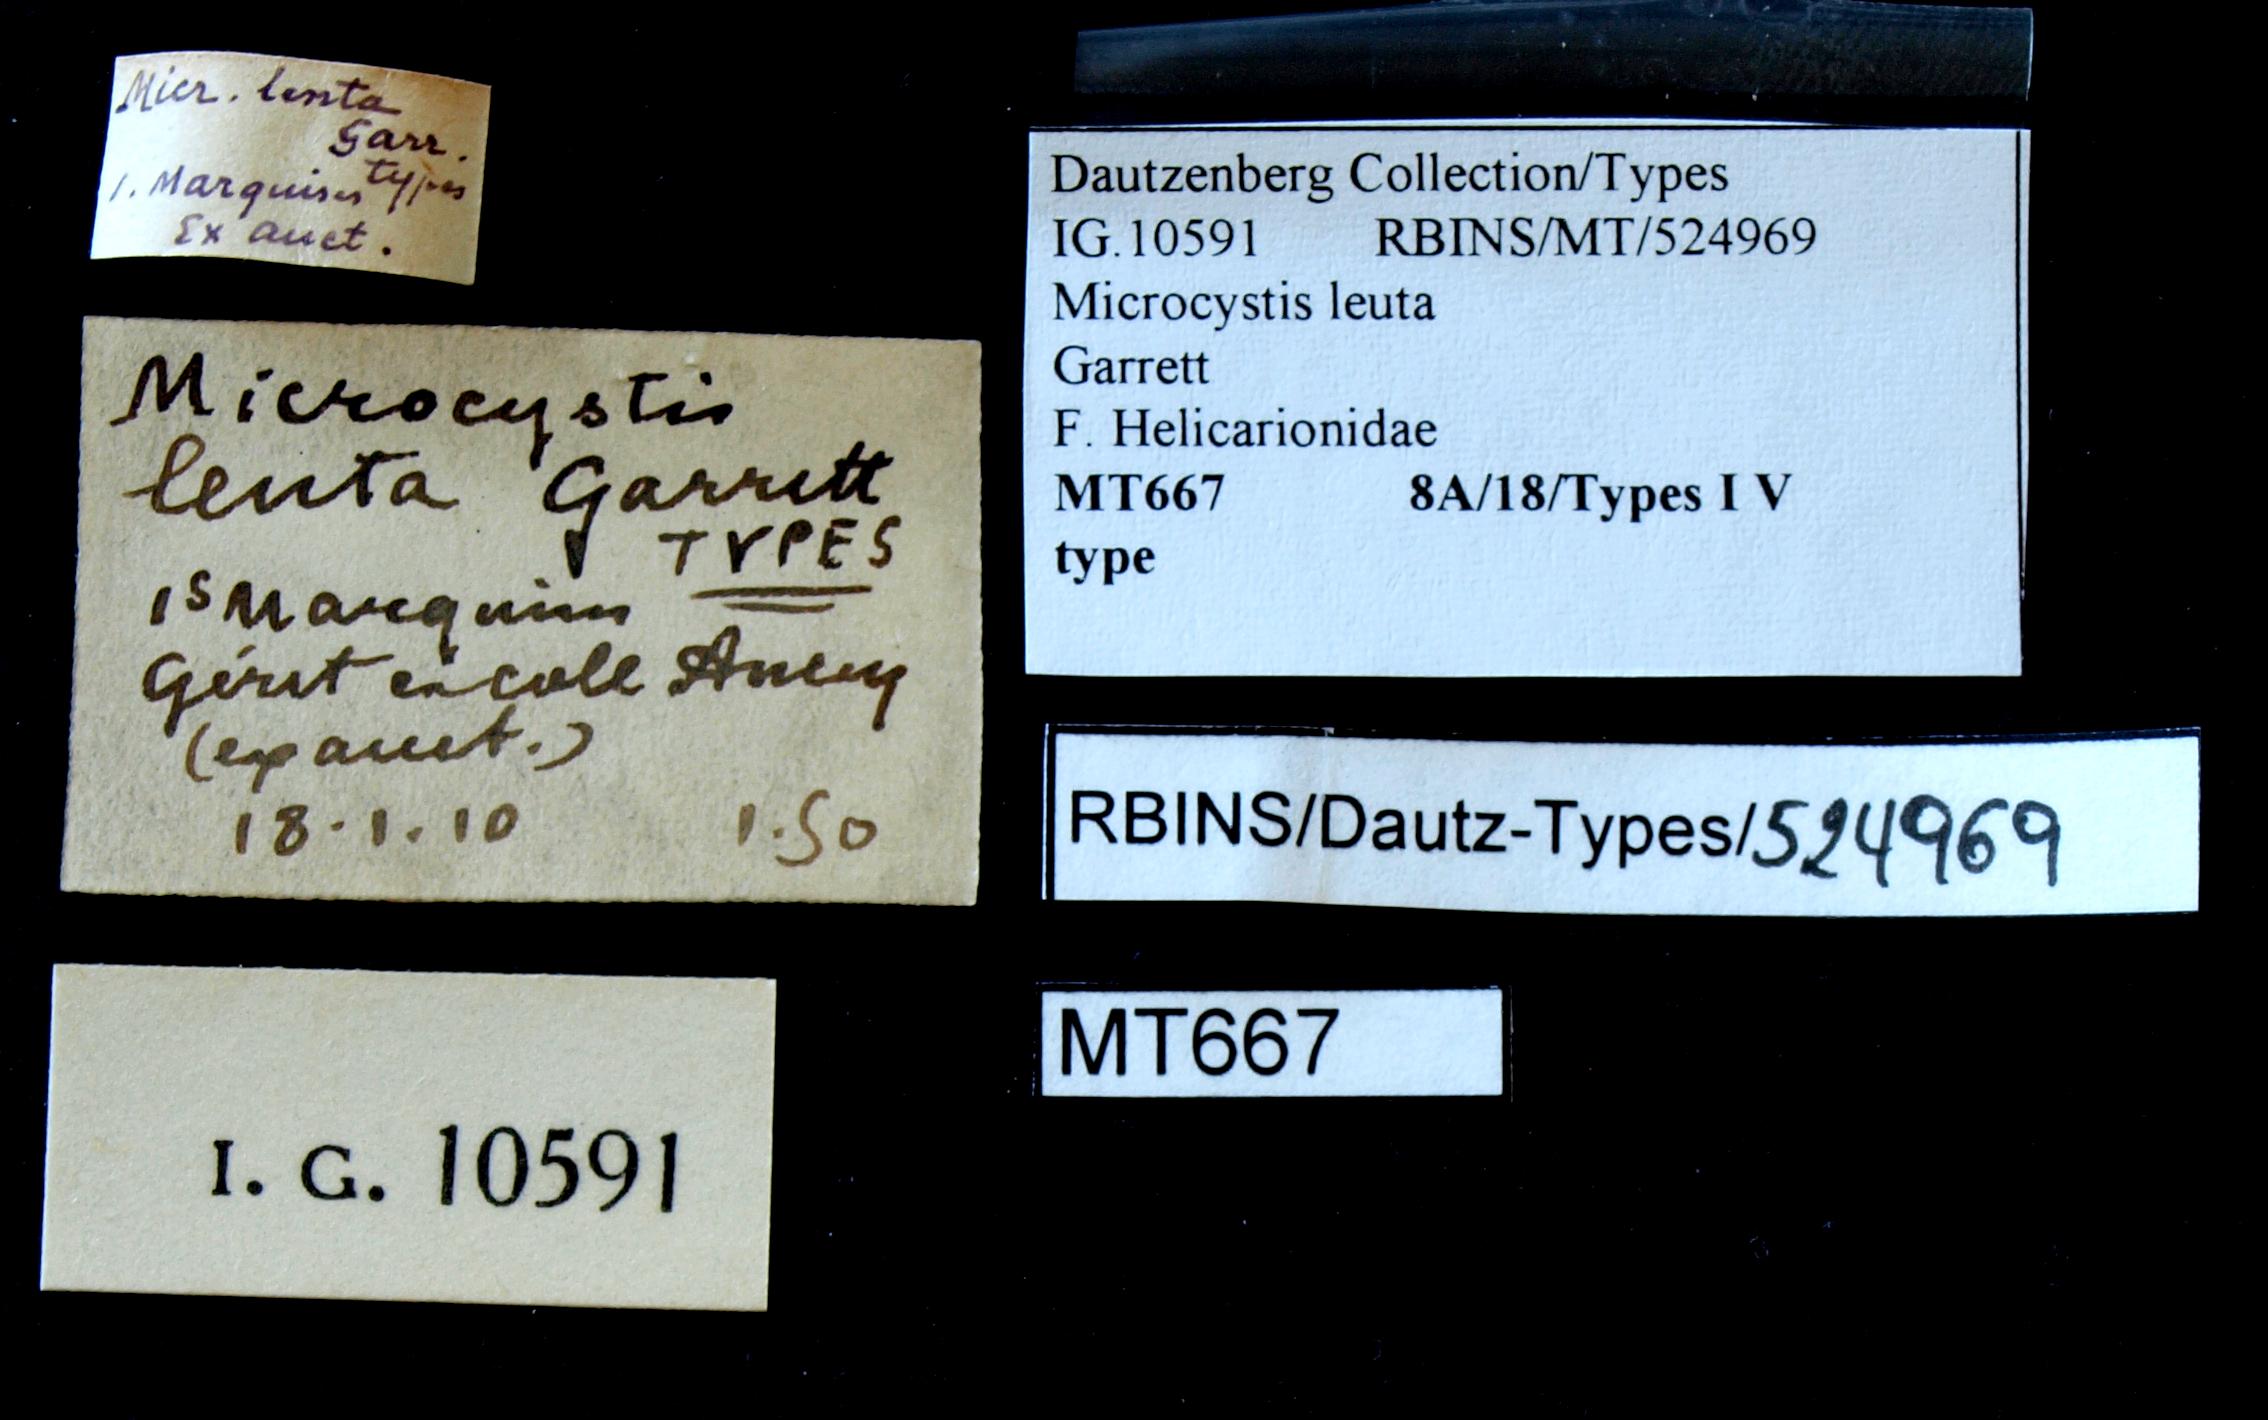 BE-RBINS-INV TYPE MT 667 Microcystis lenta LABELS.jpg